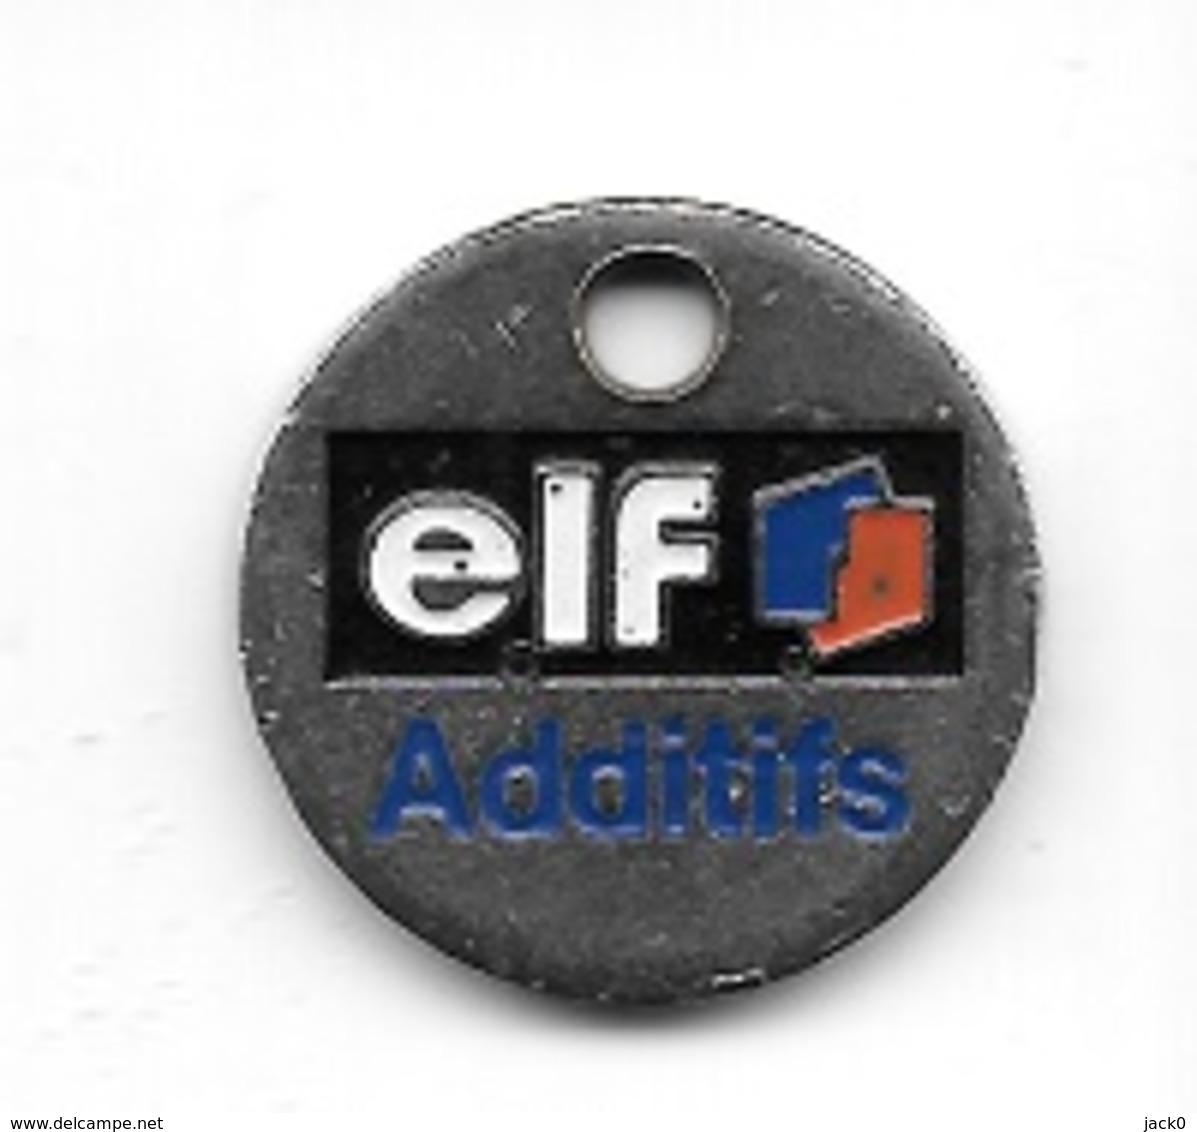 Jeton De Caddie Argenté  Marque  Carburant  ELF  Additifs  Verso  ADDITIFS, DEGRAISSANTS, BIOCIDES - Jetons De Caddies